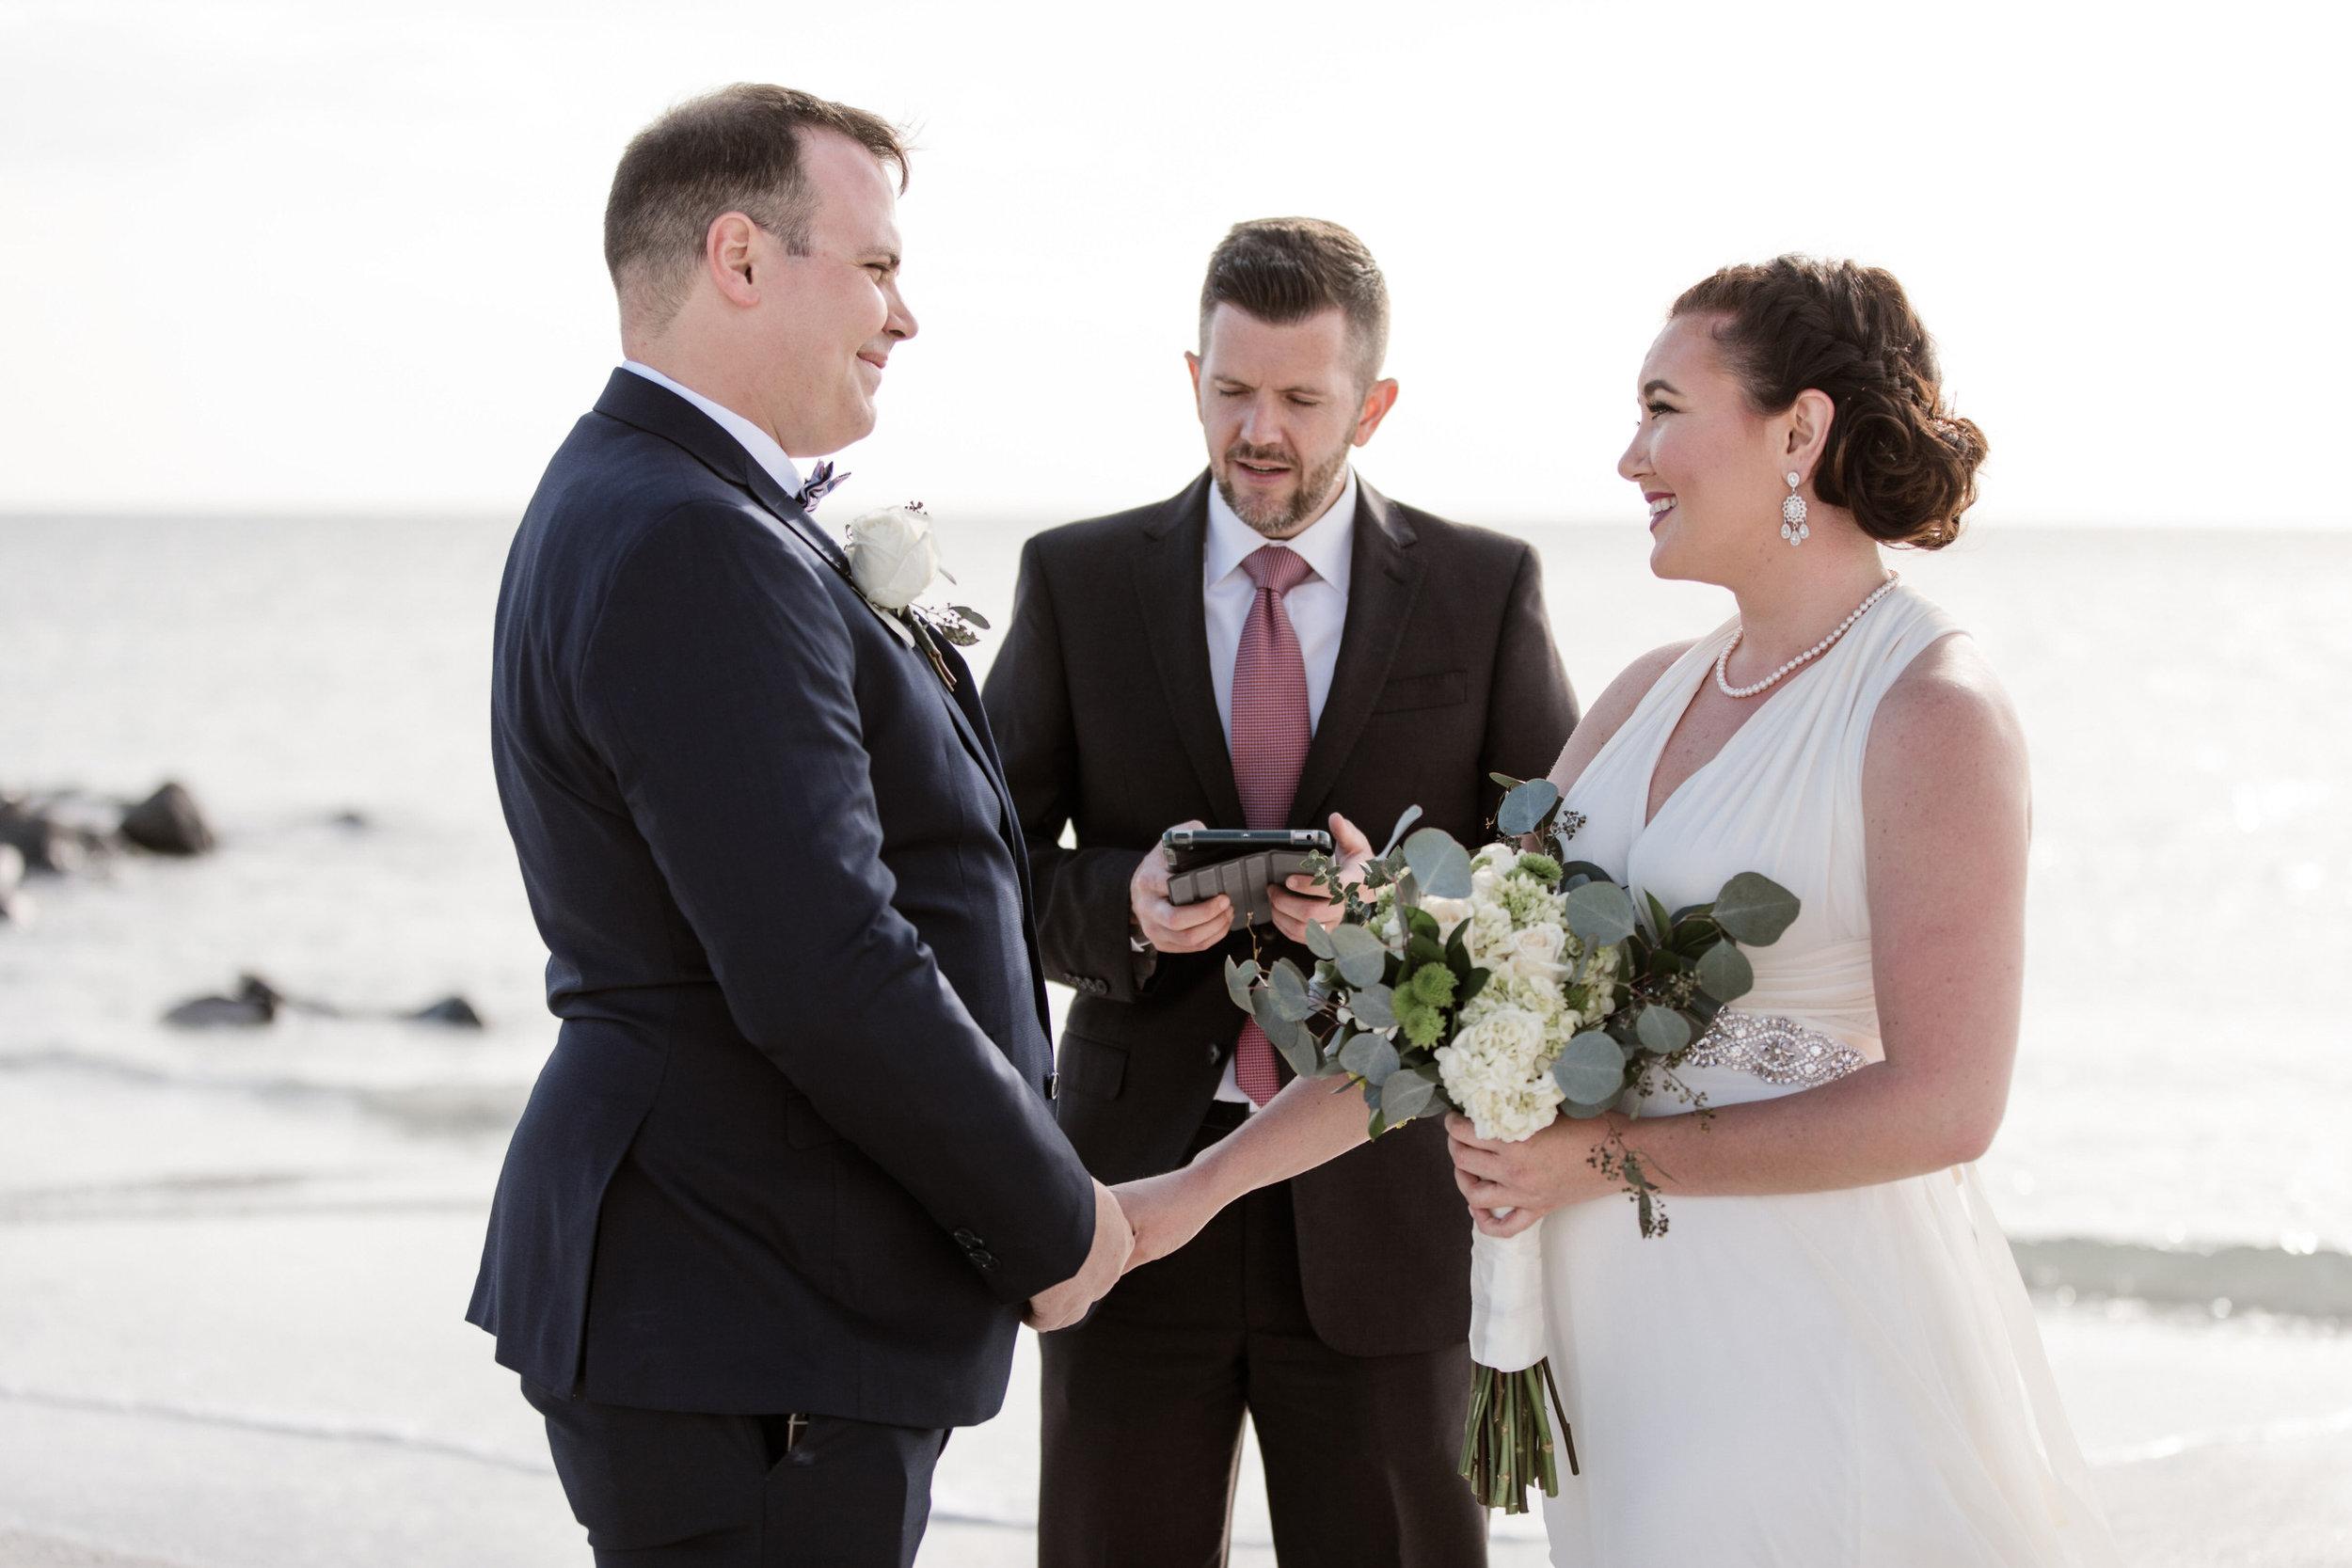 Beltran_Treasure_Island_Elopement_Tampa_Wedding_013-1.jpg